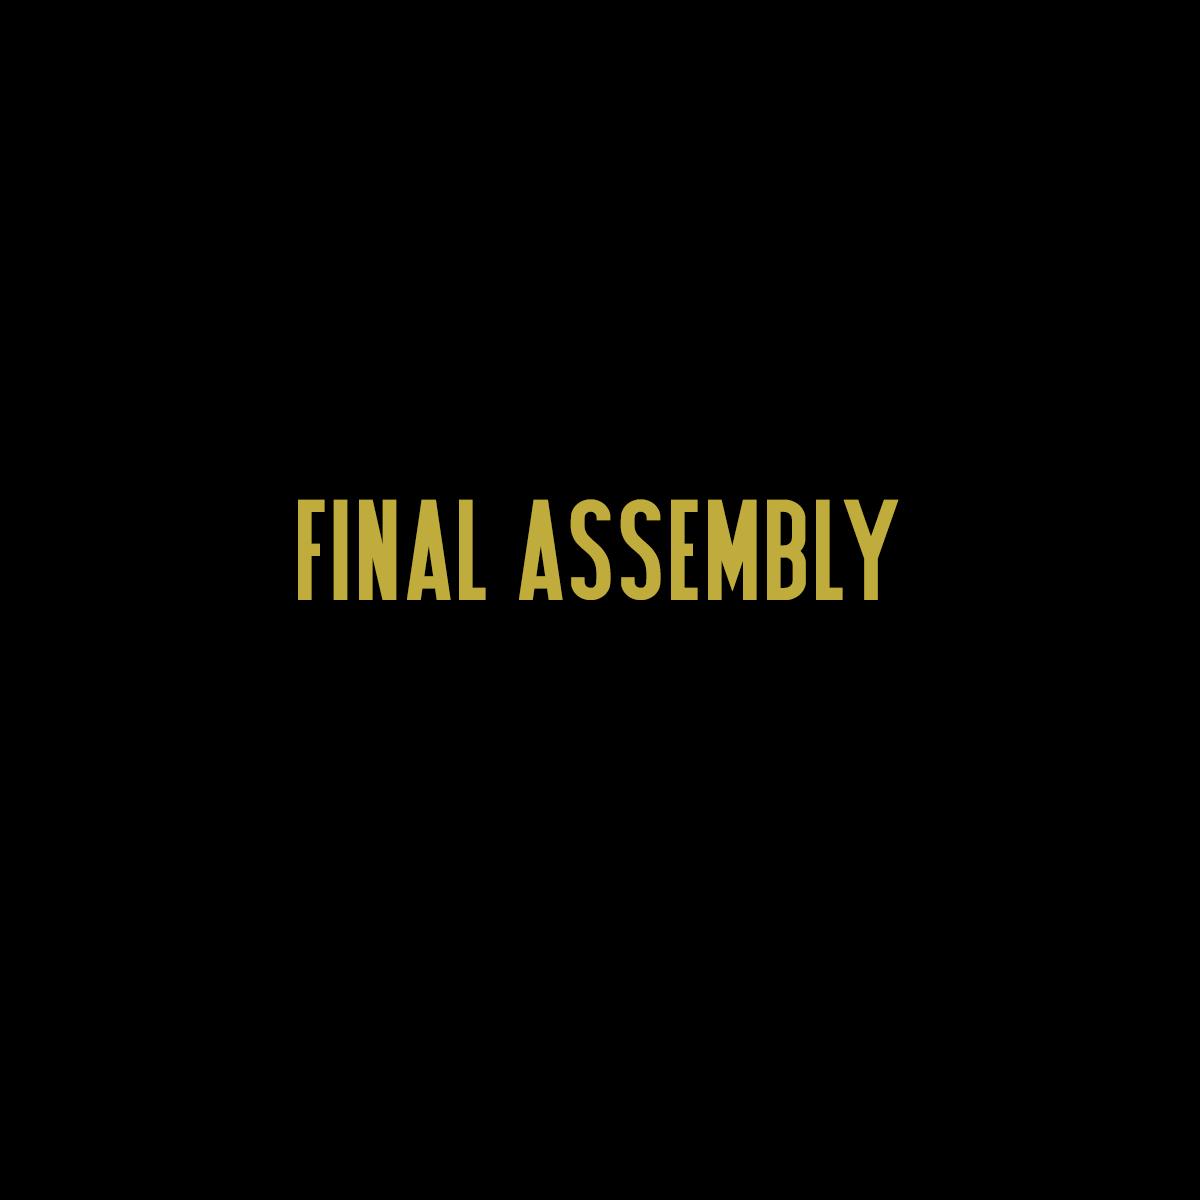 Final Assembly.jpg